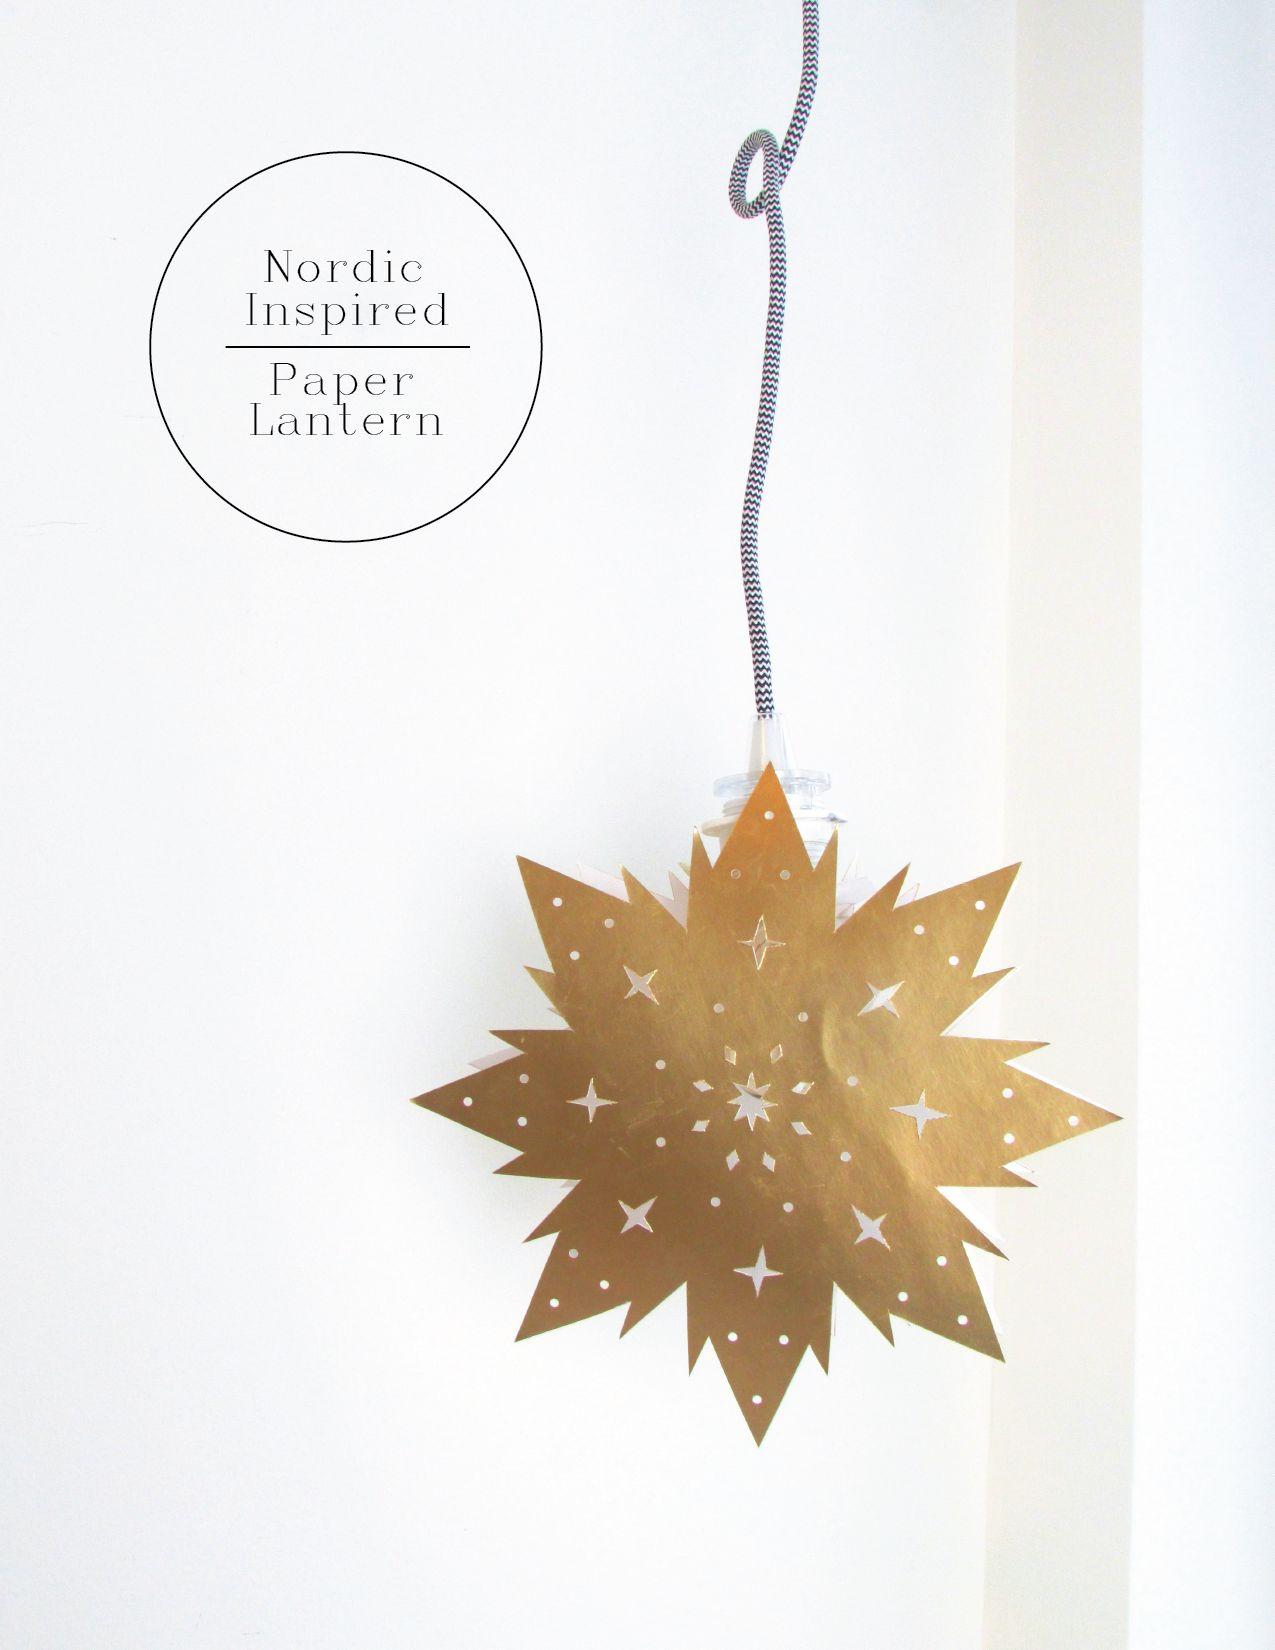 Nordic Inspired Paper Star Lantern